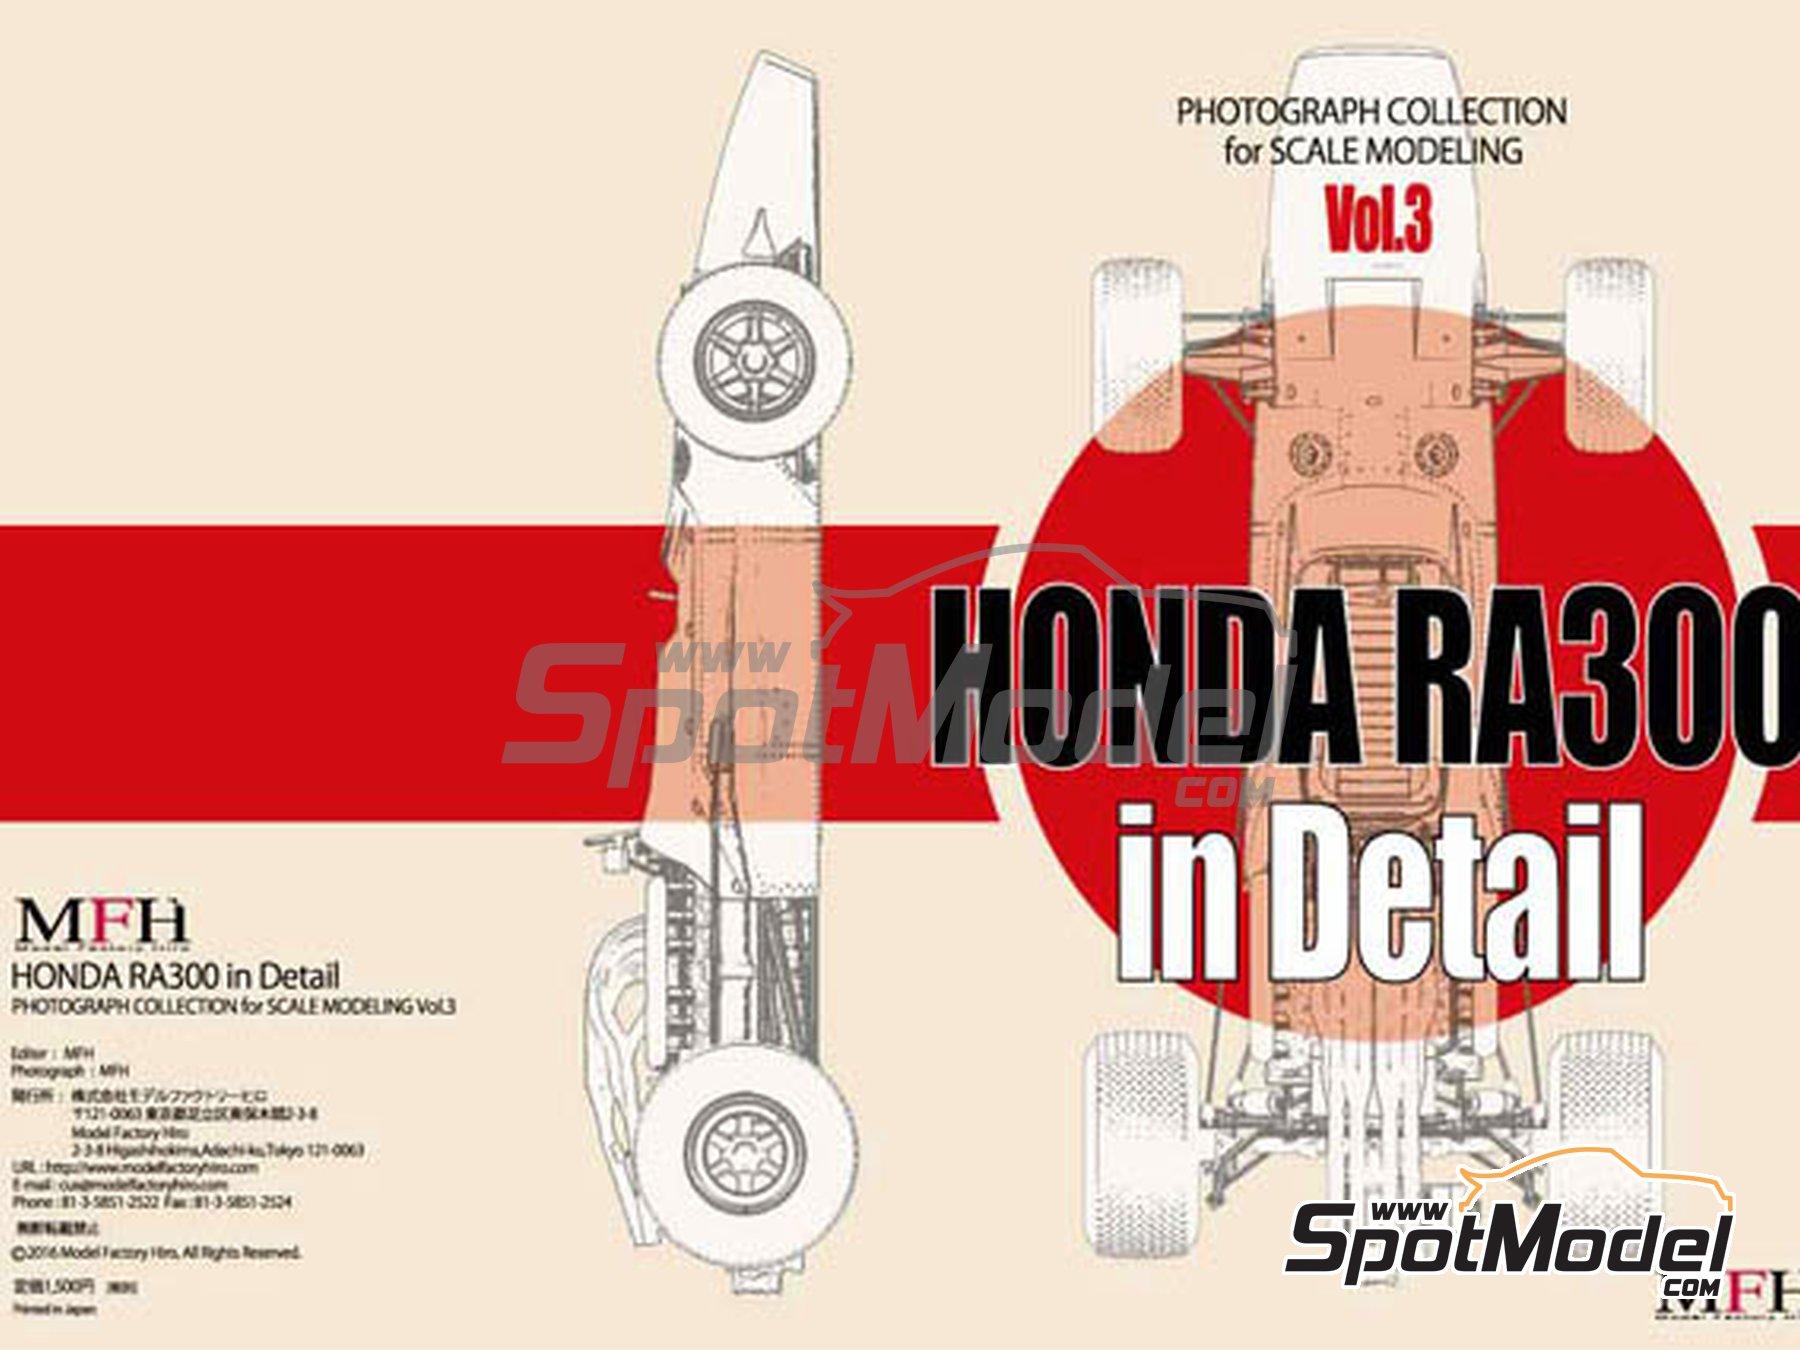 Image 1: Honda RA300 | Libro de referencia fabricado por Model Factory Hiro (ref.MFH-MHB-3)